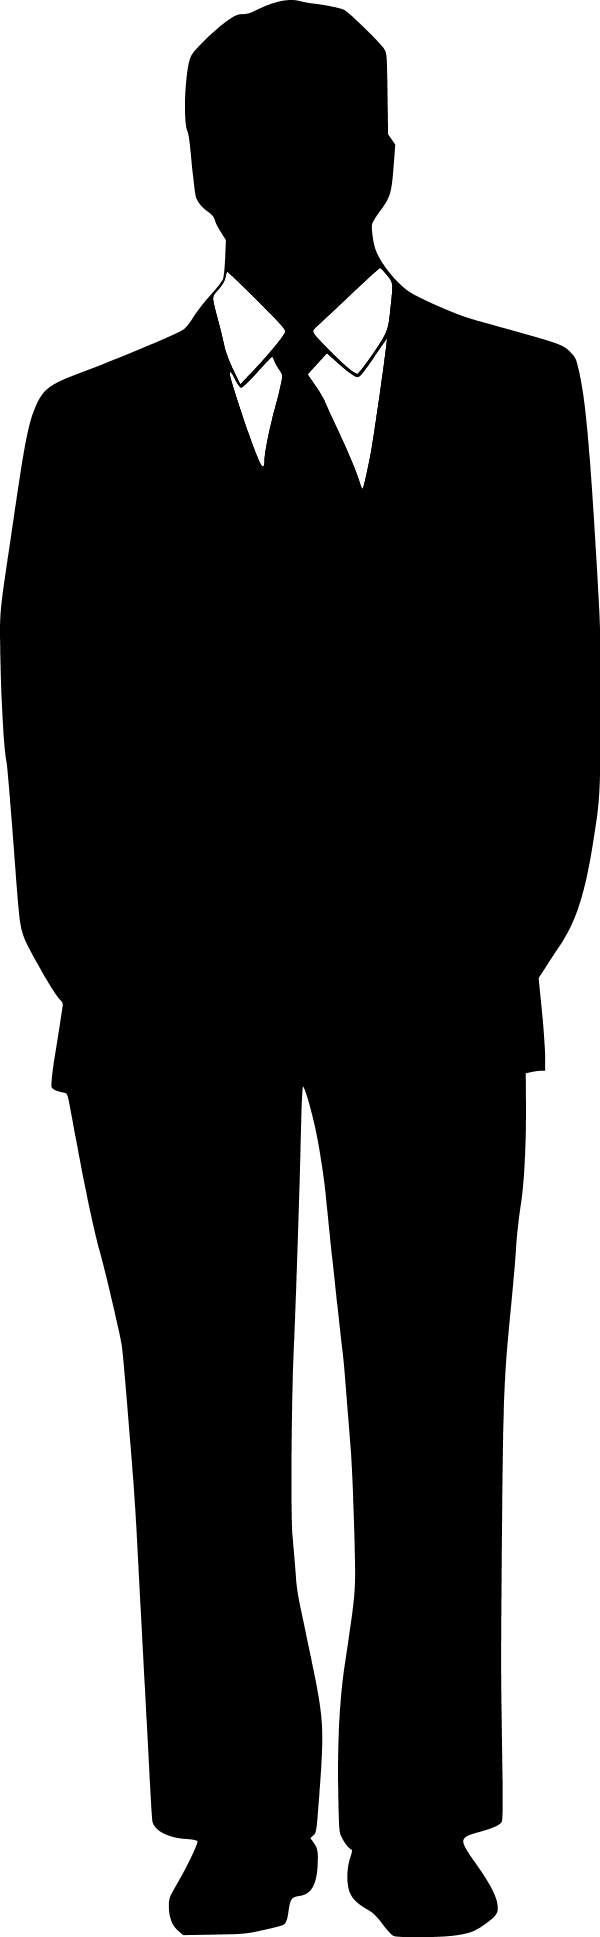 jpg Men silhouette clip art. Black man clipart